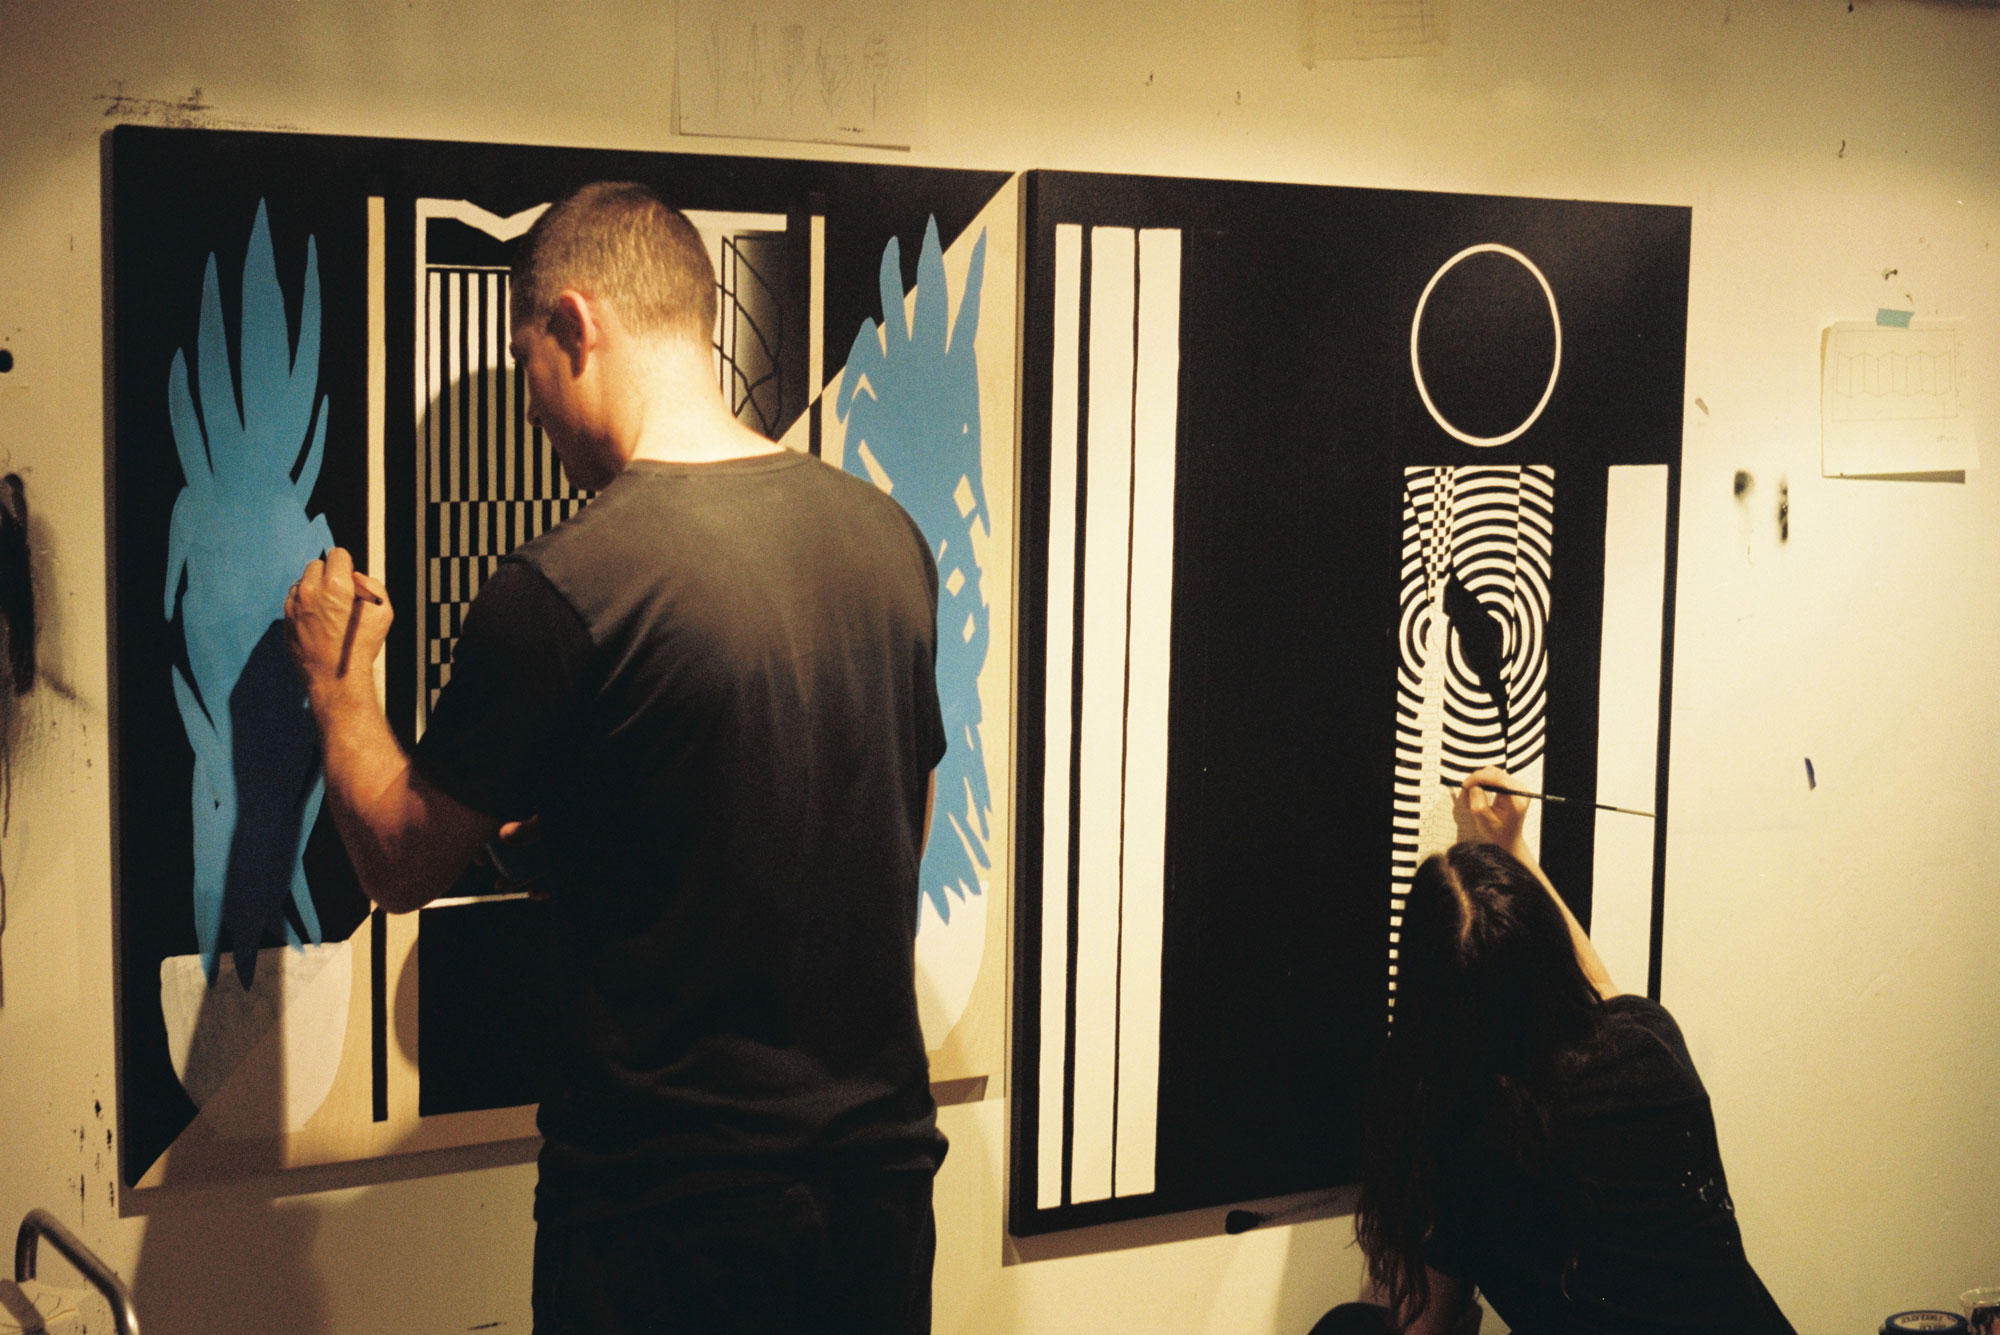 tom-gerrard-artist-barry-mansfield-photo-2.JPG